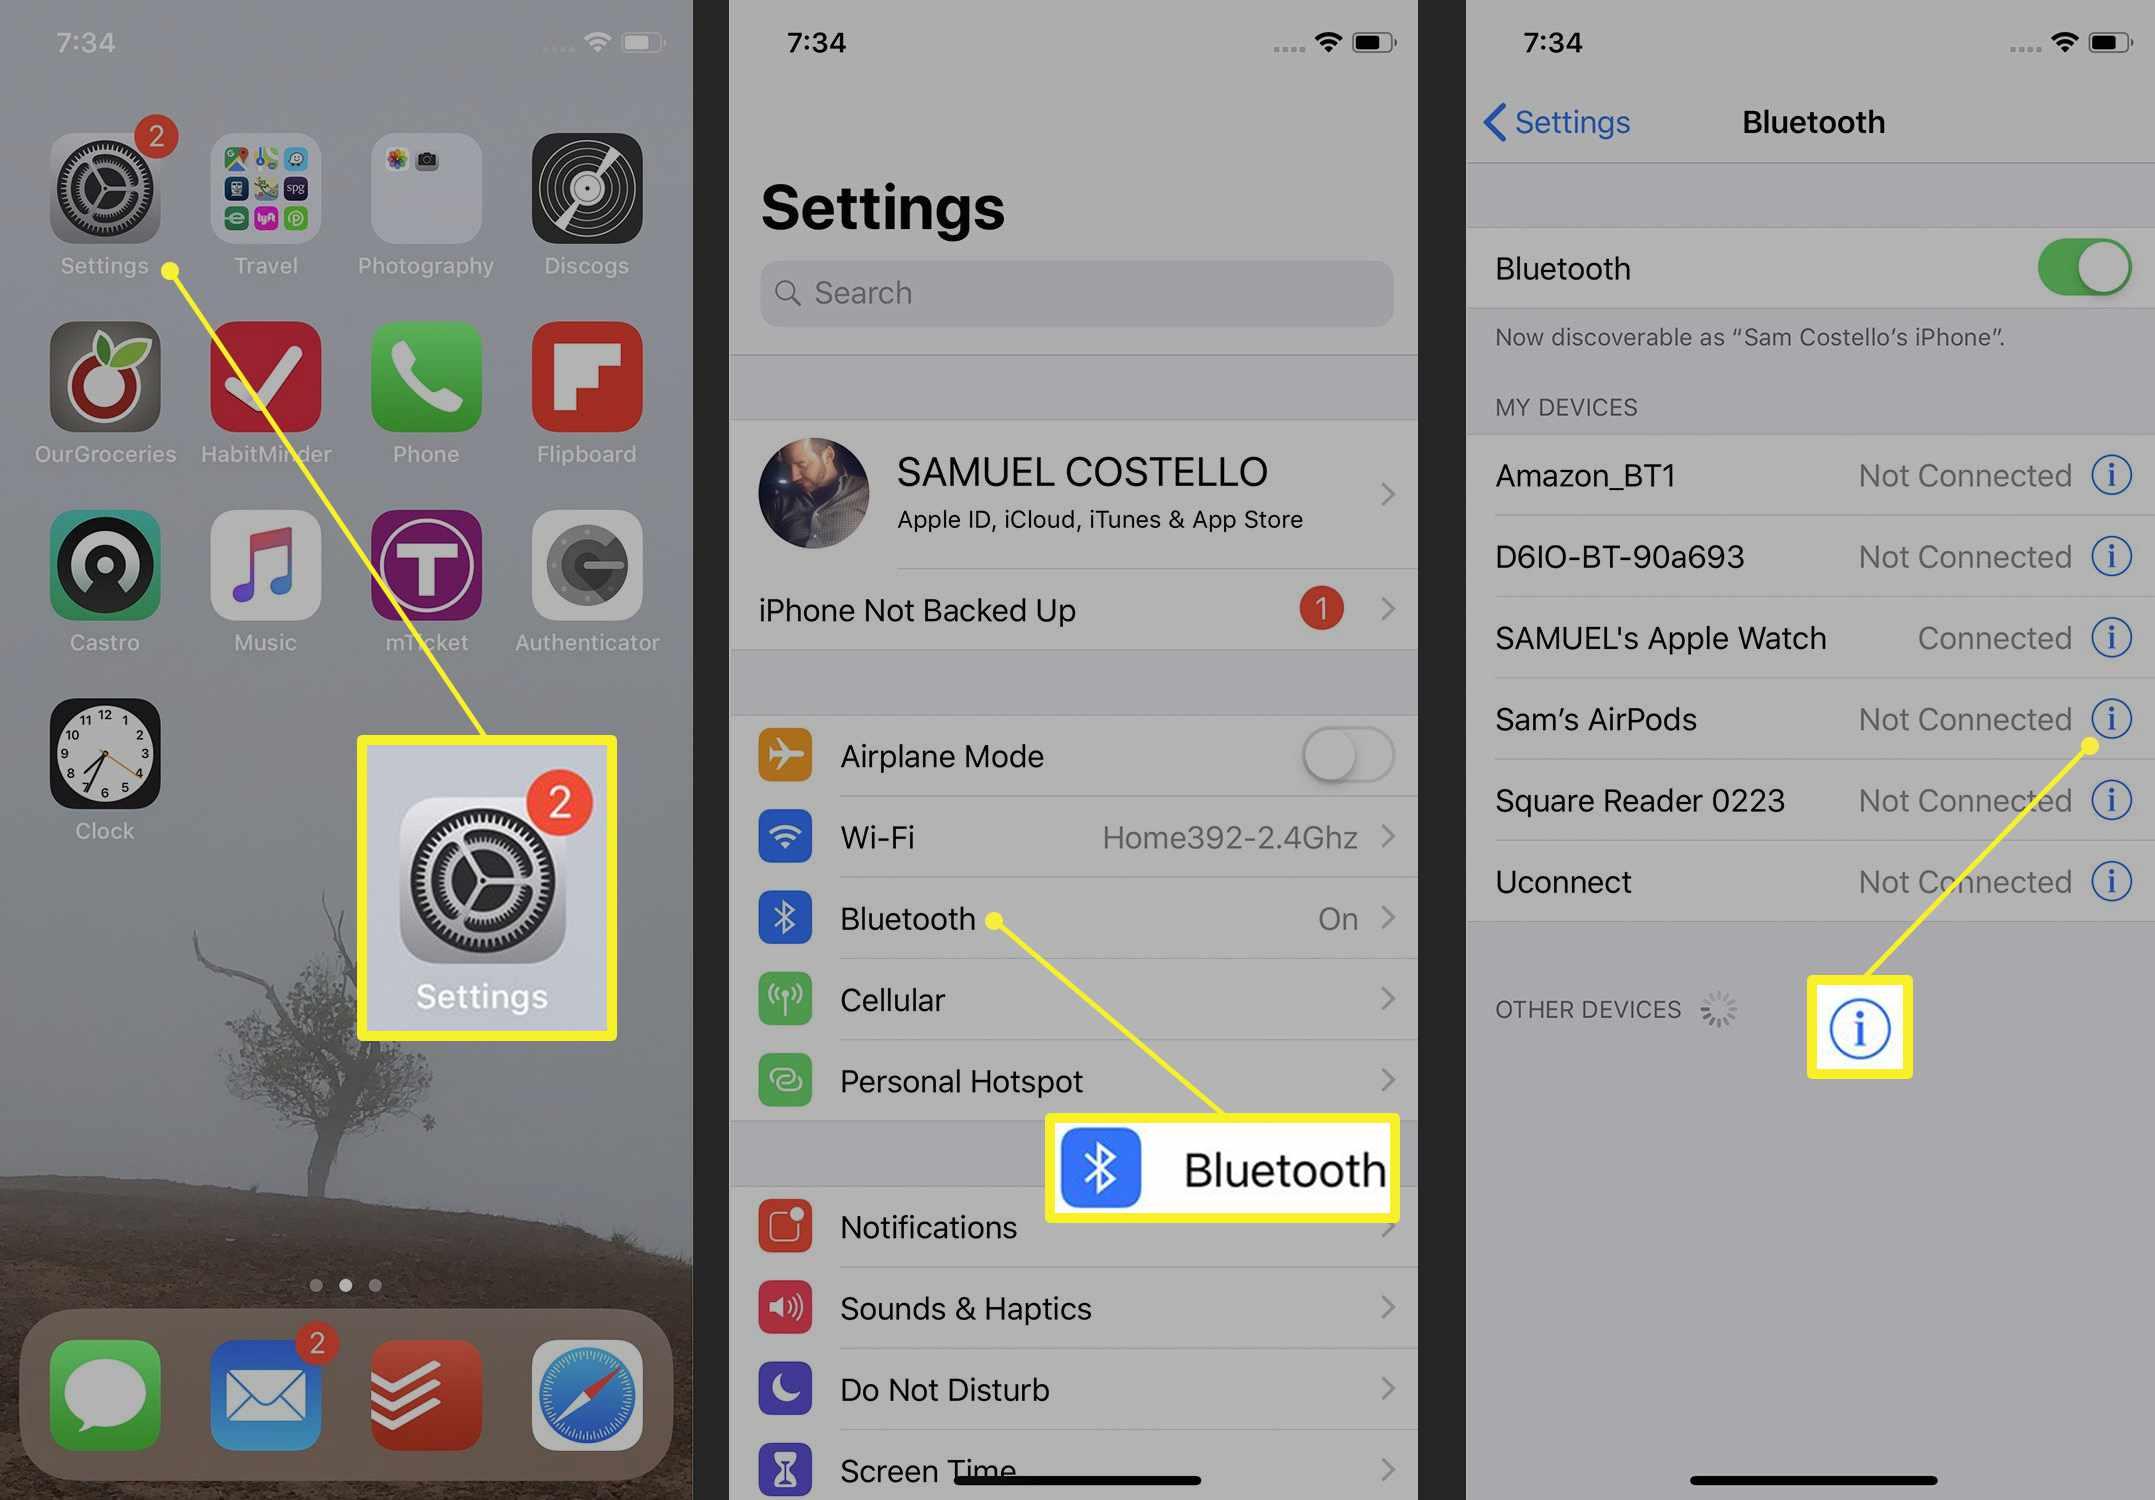 Bluetooth settings on iPhone